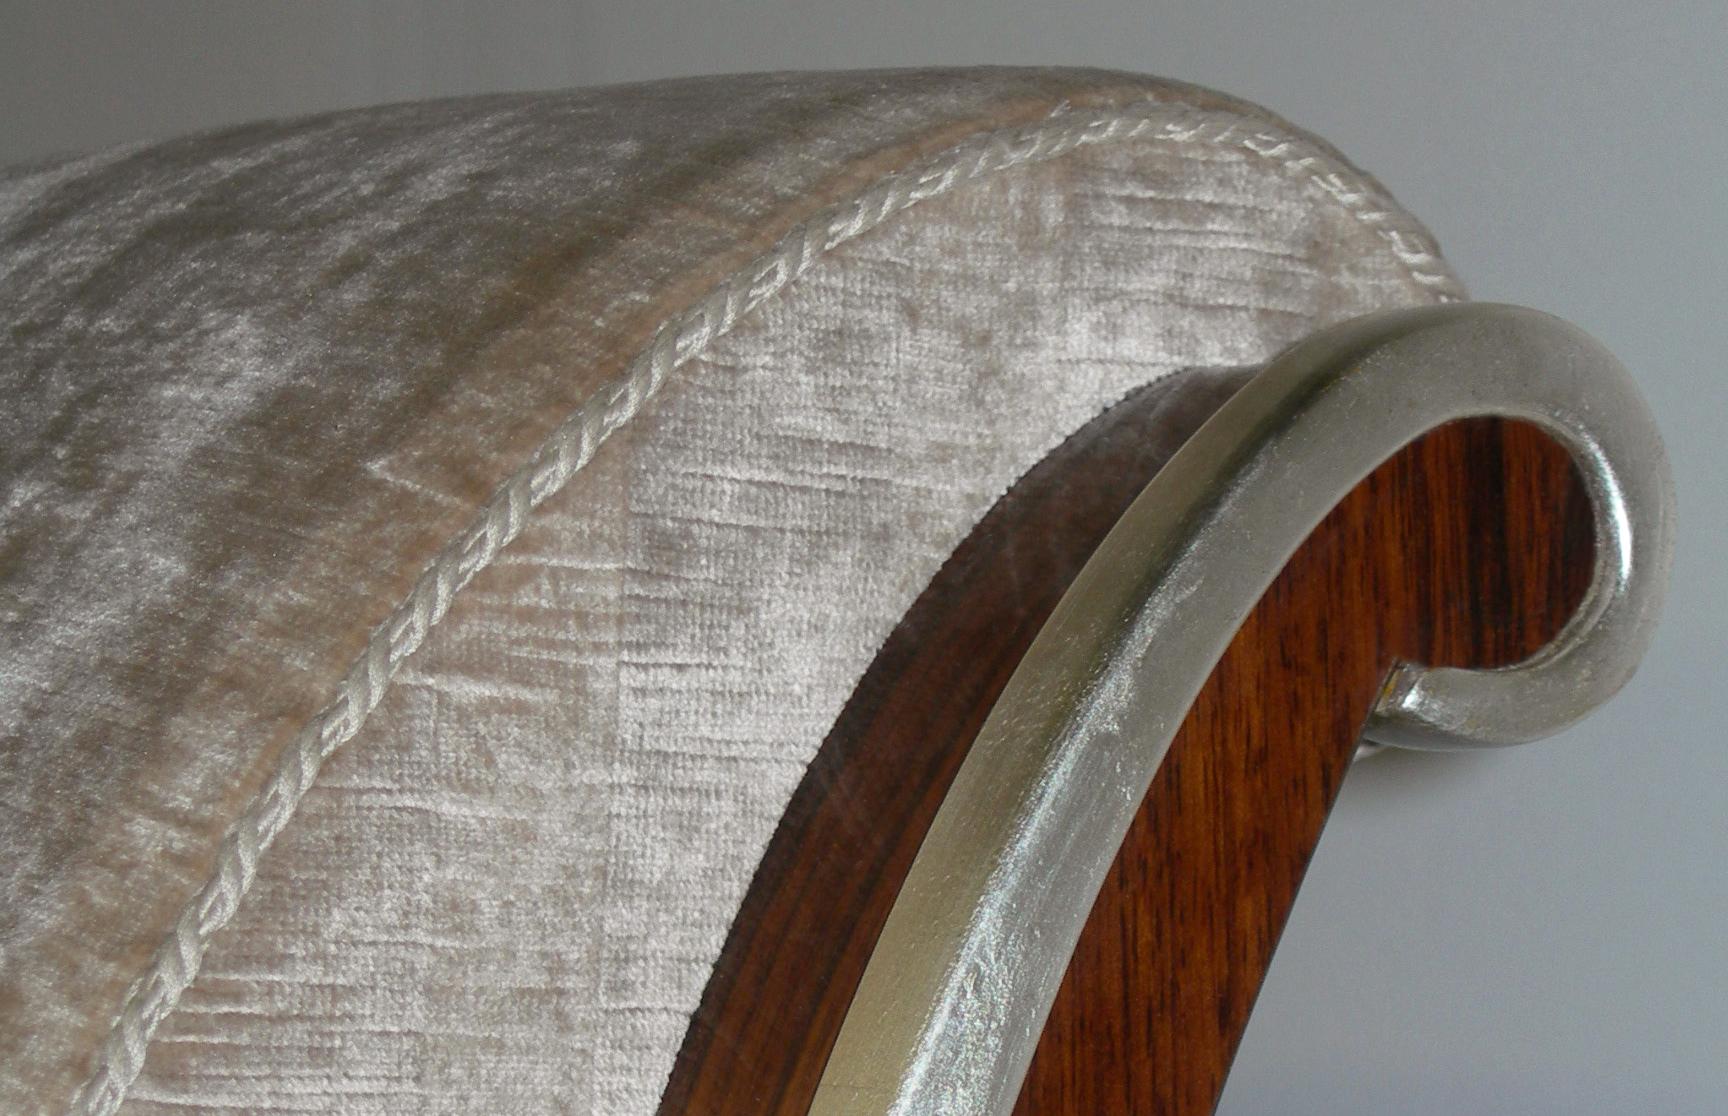 Headboard detail